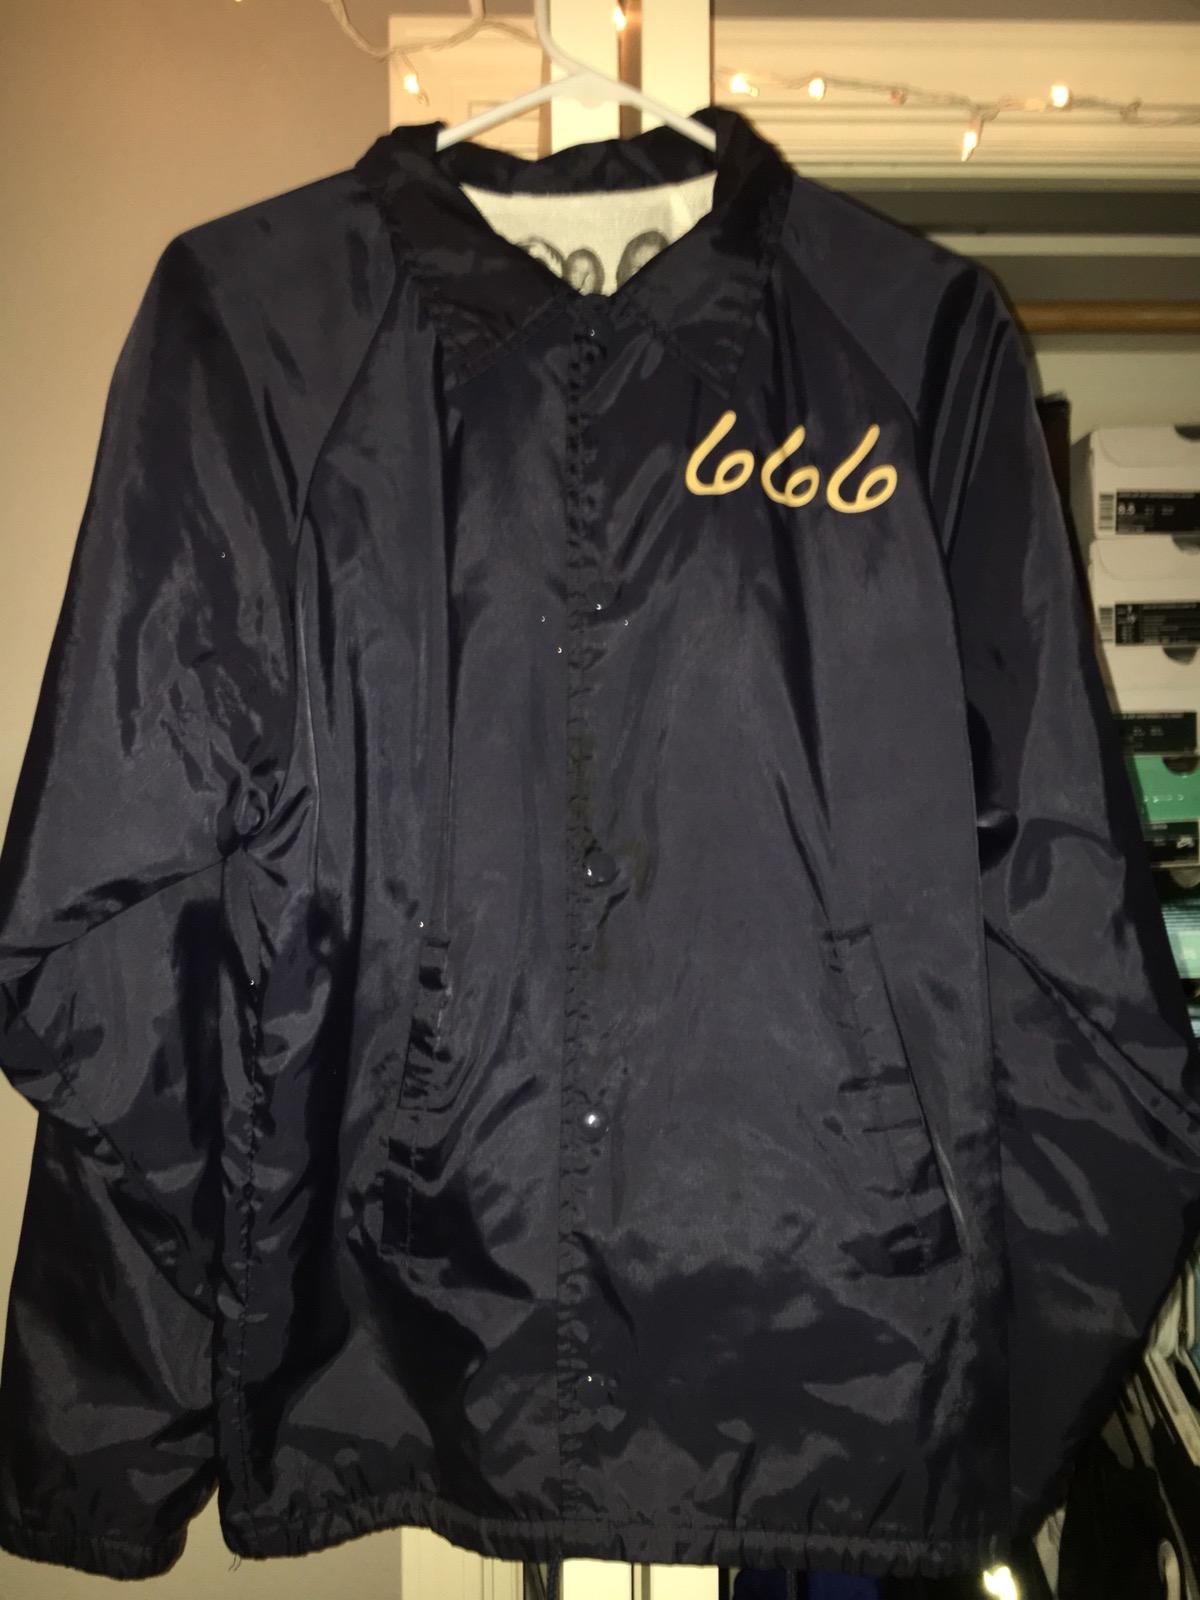 6238f37eefe7 Odd Future TRIP SIX COACH JACKET Size m - Light Jackets for Sale - Grailed